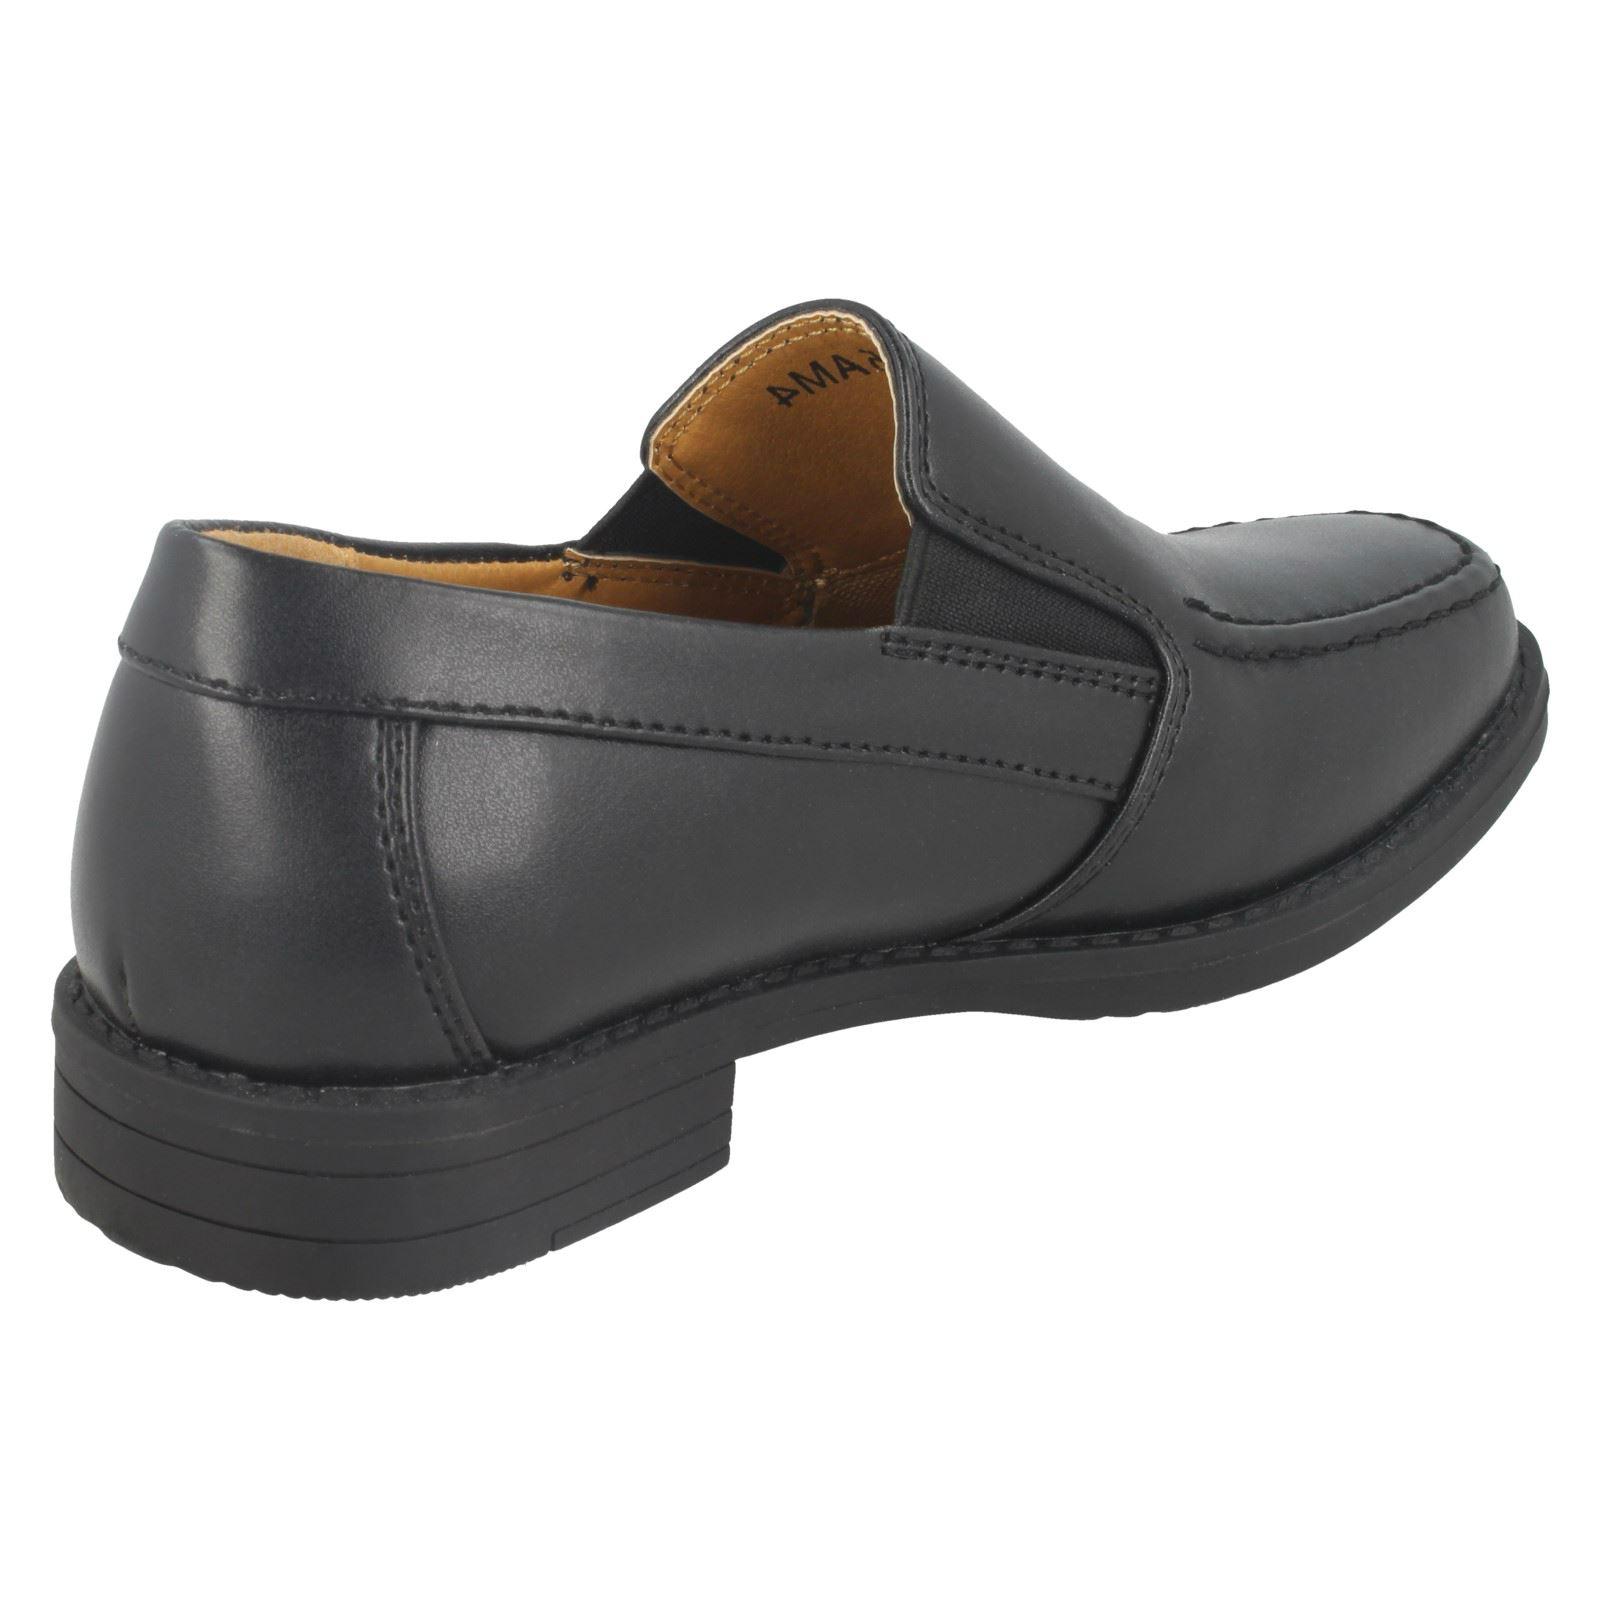 Boys Clarks Smart Slip On School Shoes Corris Step